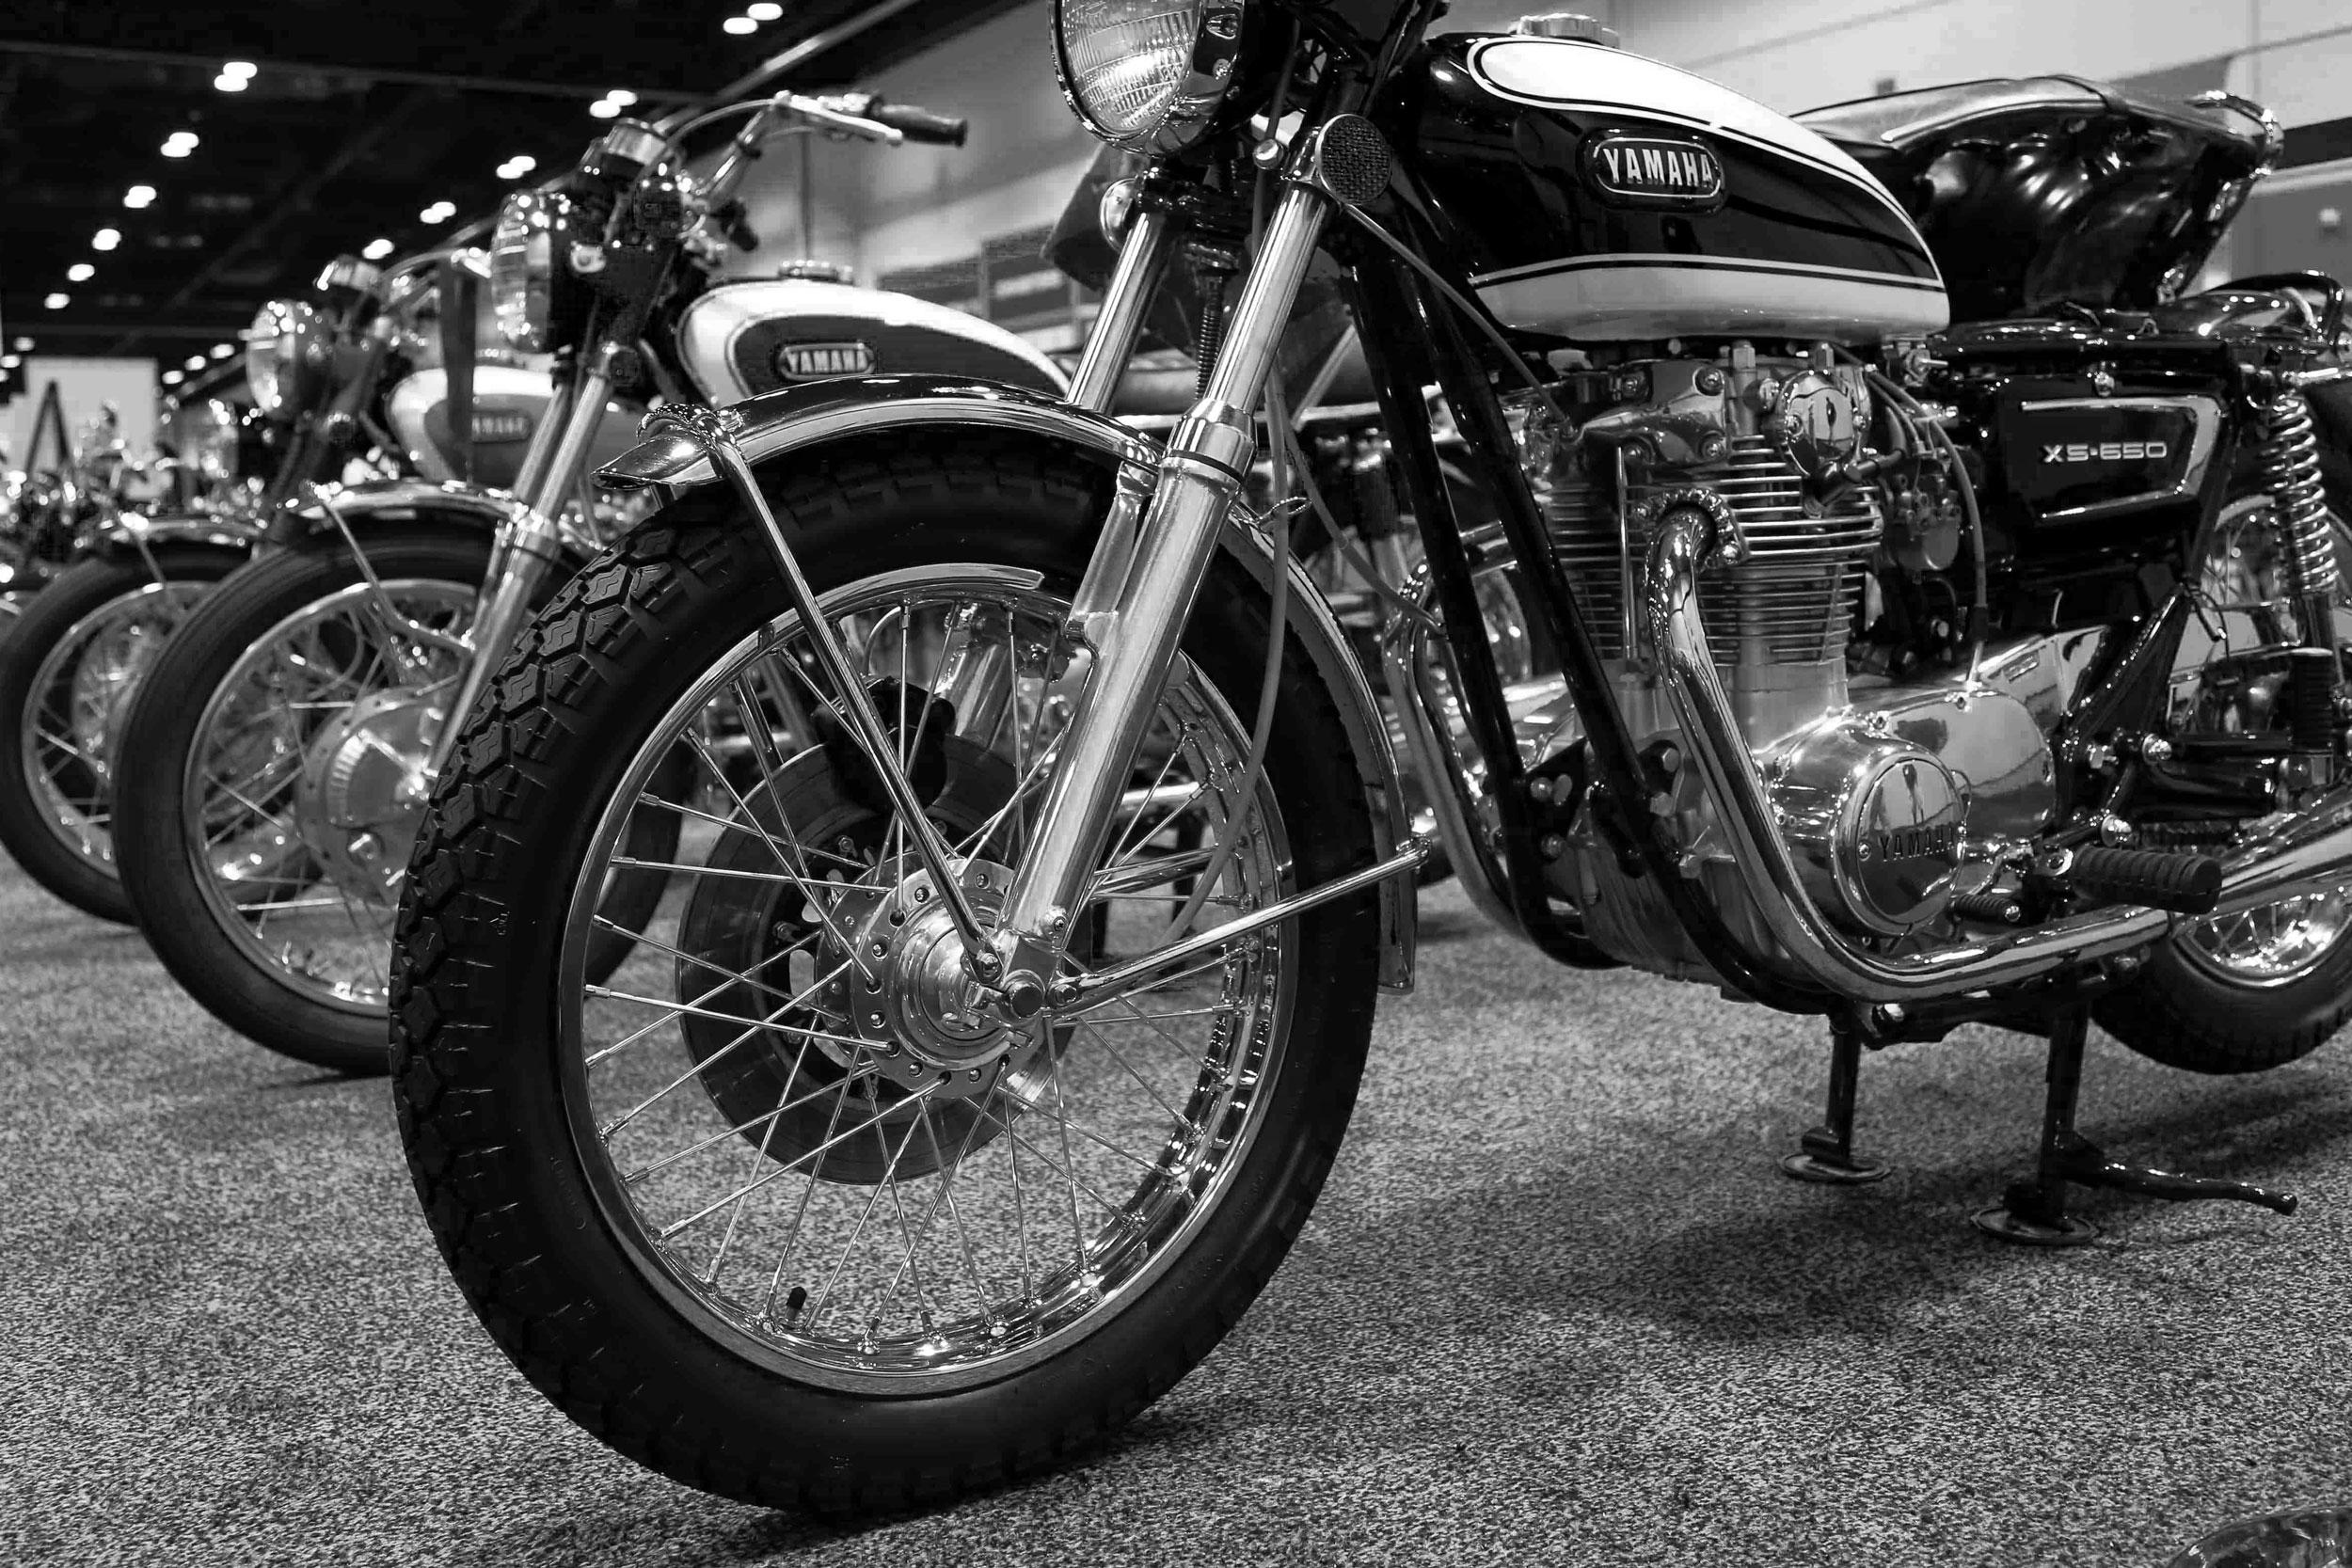 Motor-Old-Yamaha.jpg